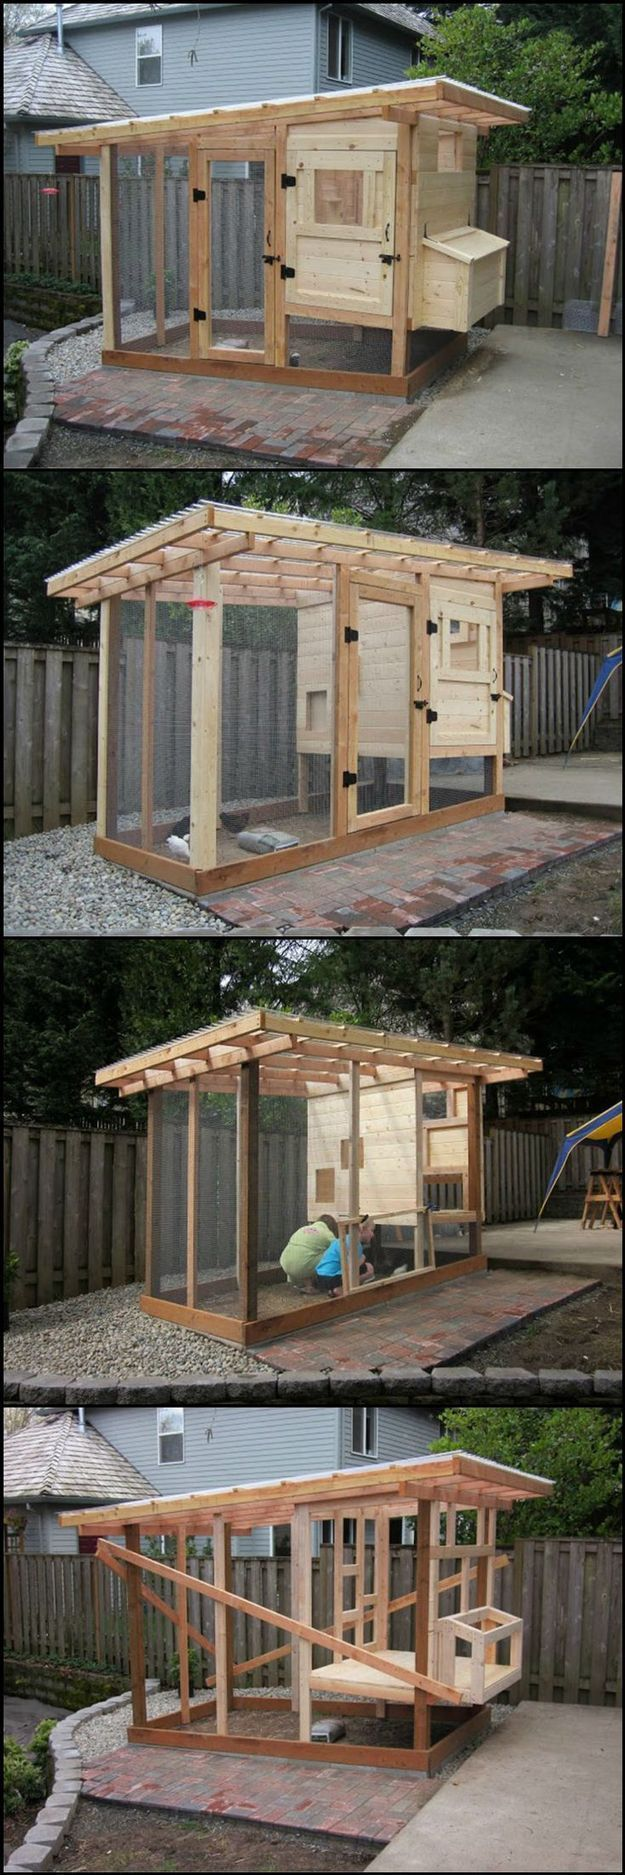 Backyard Chicken Coop Ideas chicken coops for backyard flocks hgtv Diy Chicken Coops You Need In Your Backyard